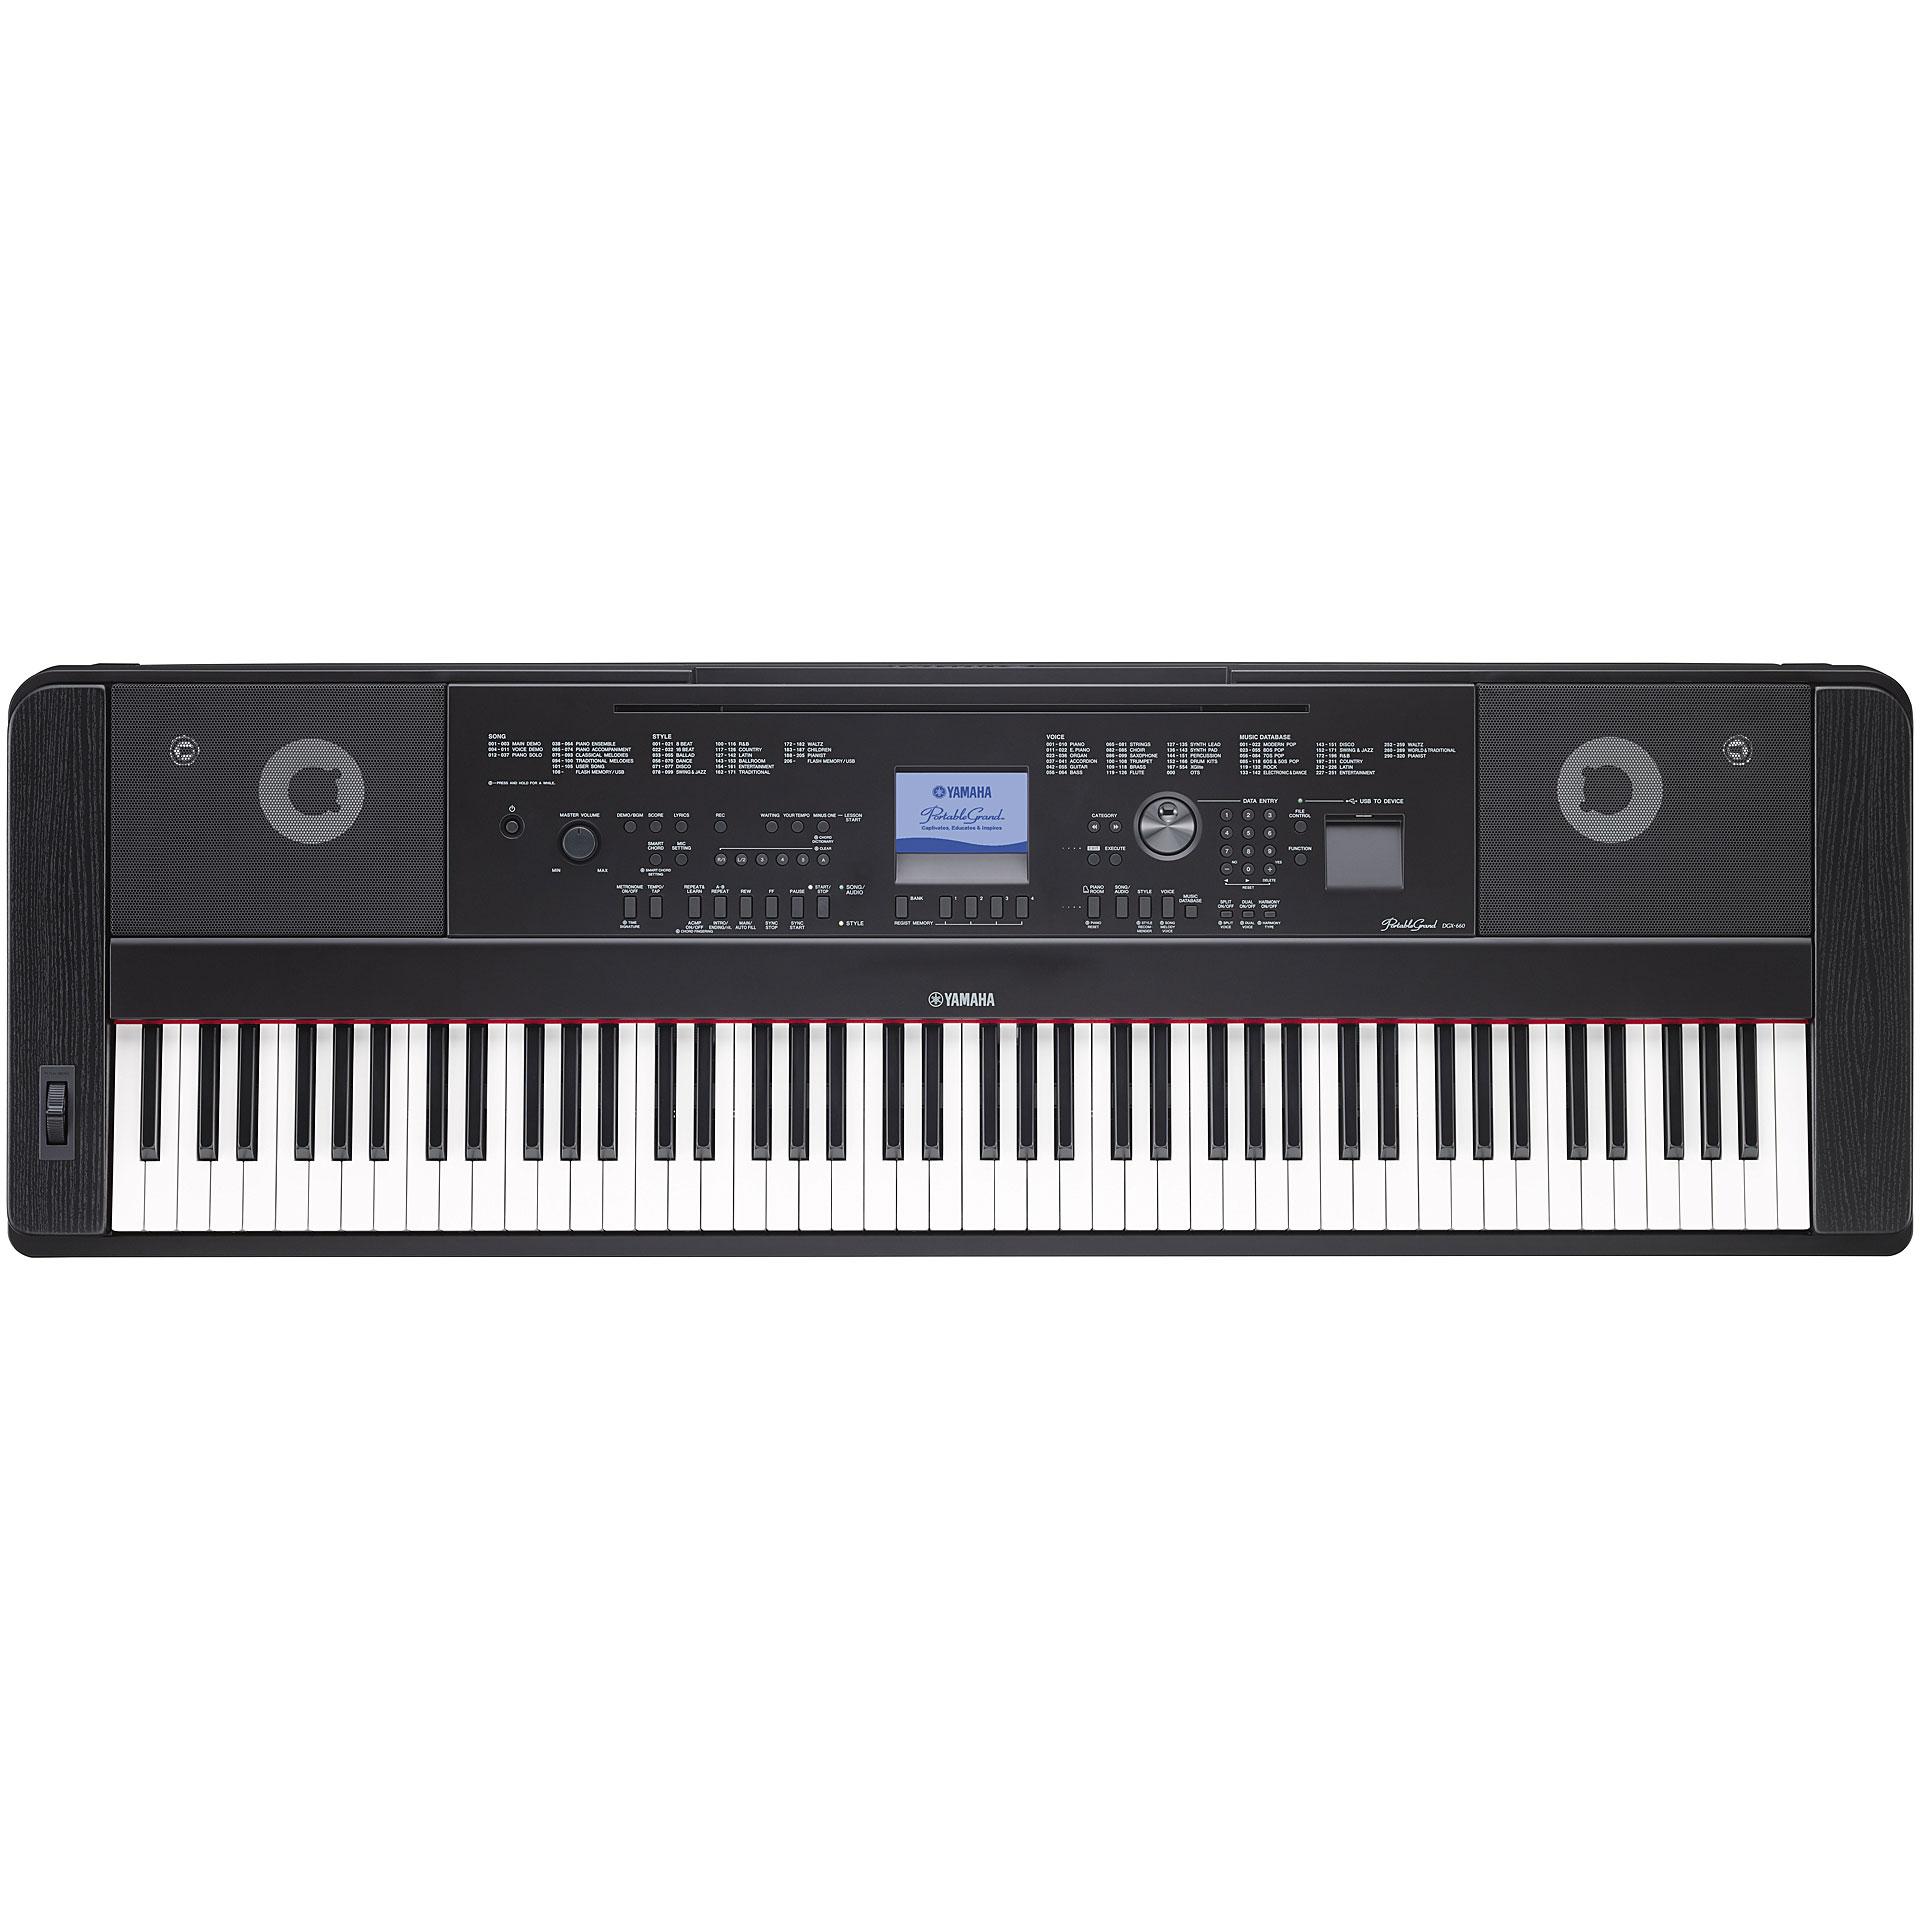 Yamaha dgx 660 b piano digital for Yamaha dgx 660 manual